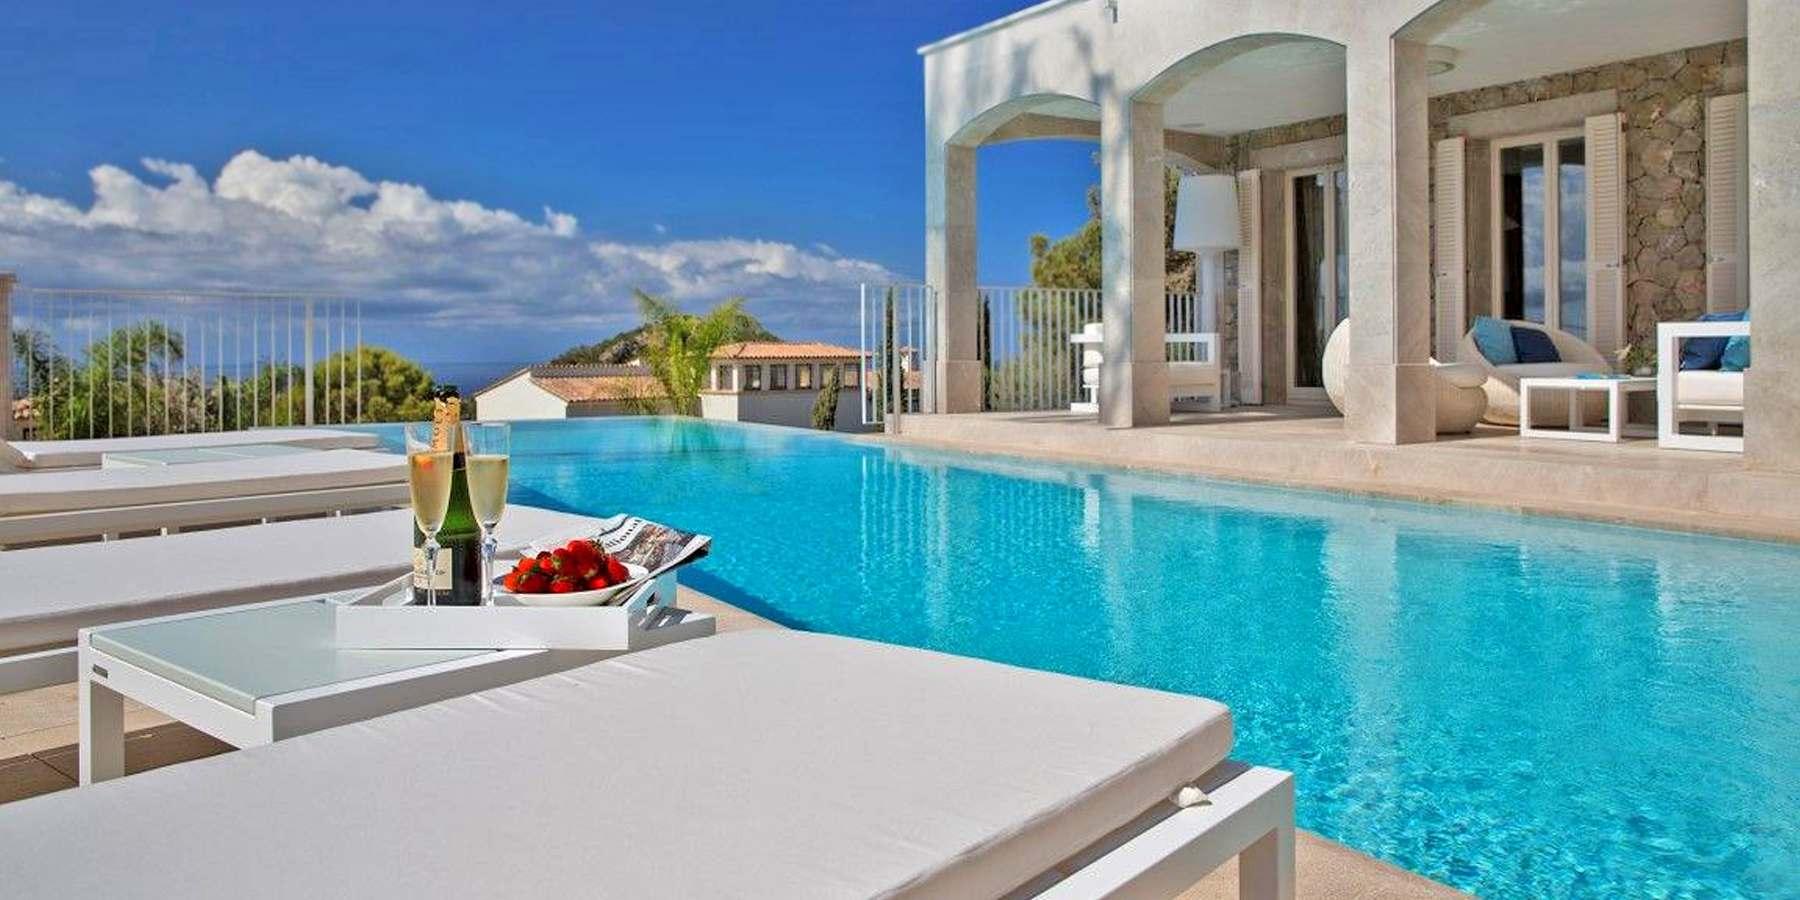 Villas in mallorca villas for holiday rentals in majorca for Holiday villas mallorca